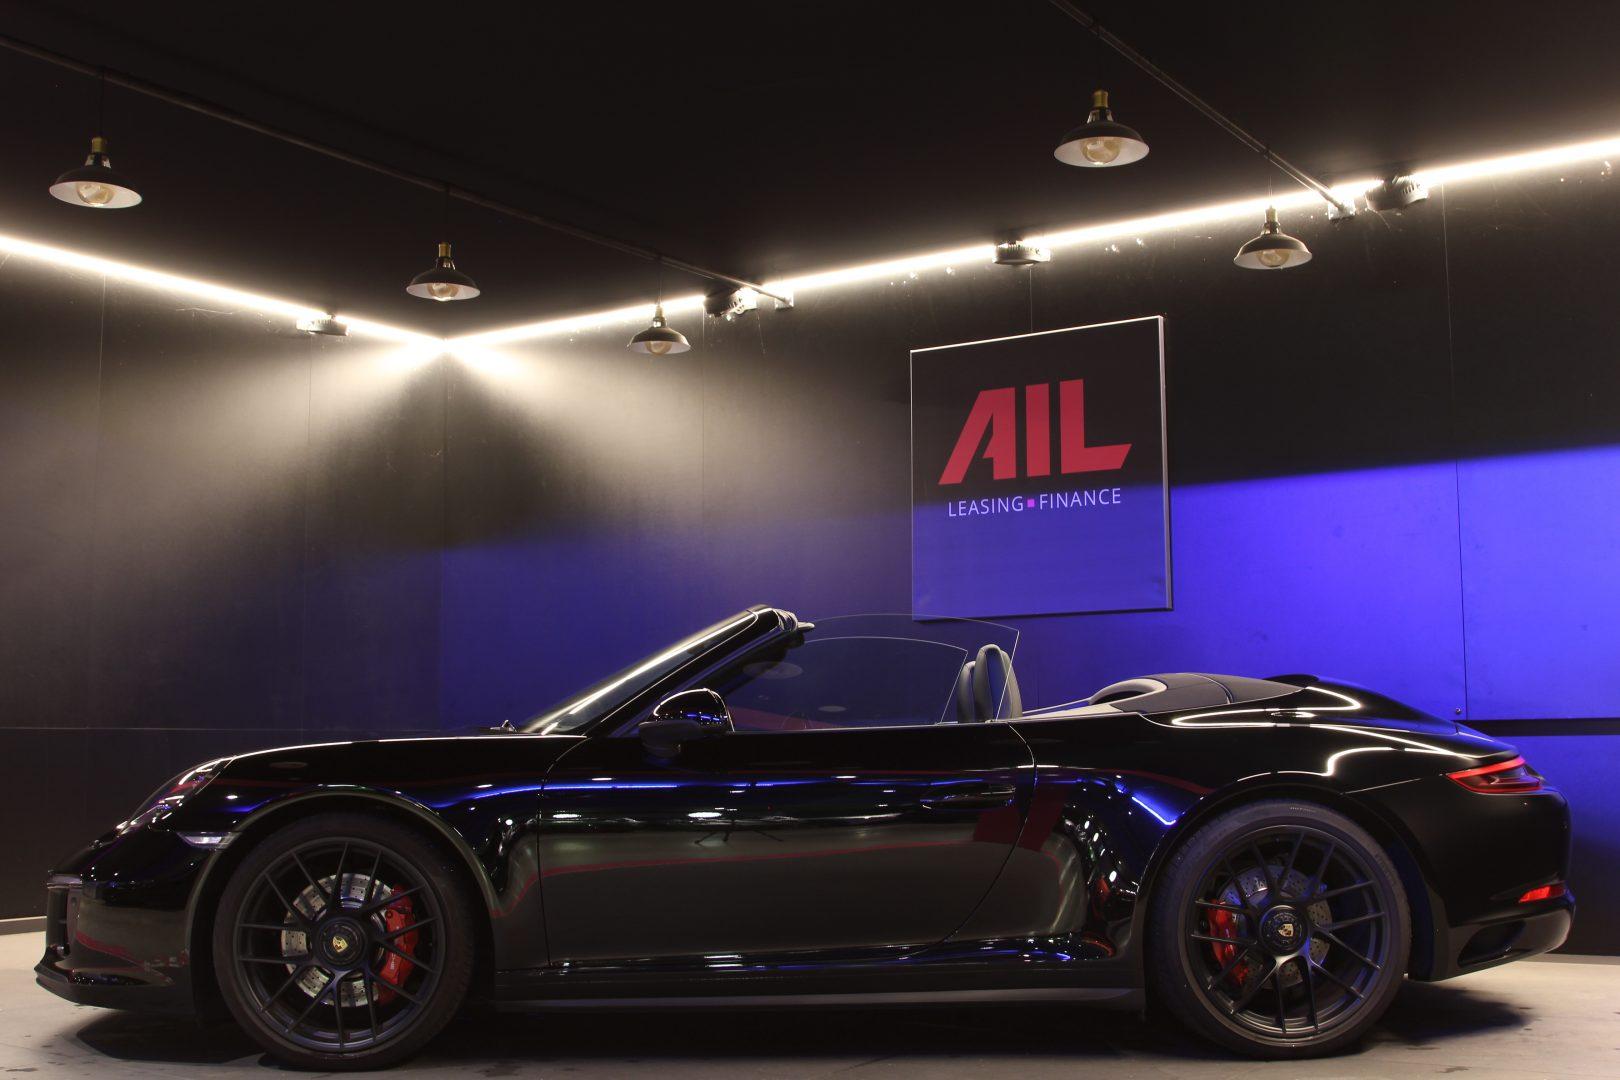 AIL Porsche 991 4 GTS Cabriolet LED Burmester High-End 1